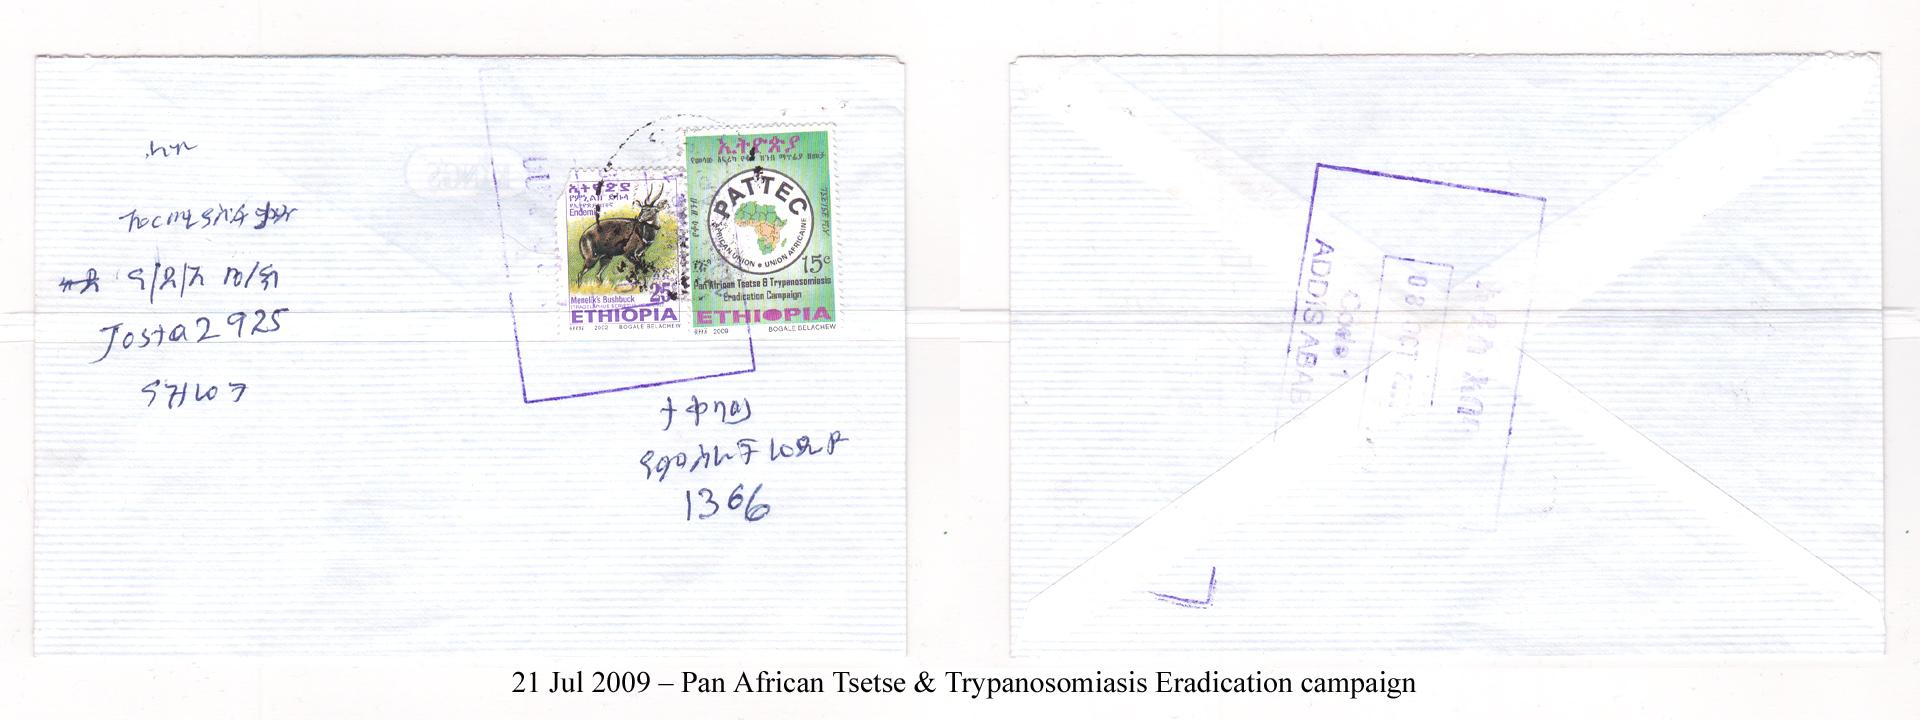 20090721 - Pan African Tsetse & Trypanosomiasis Eradication Campaign